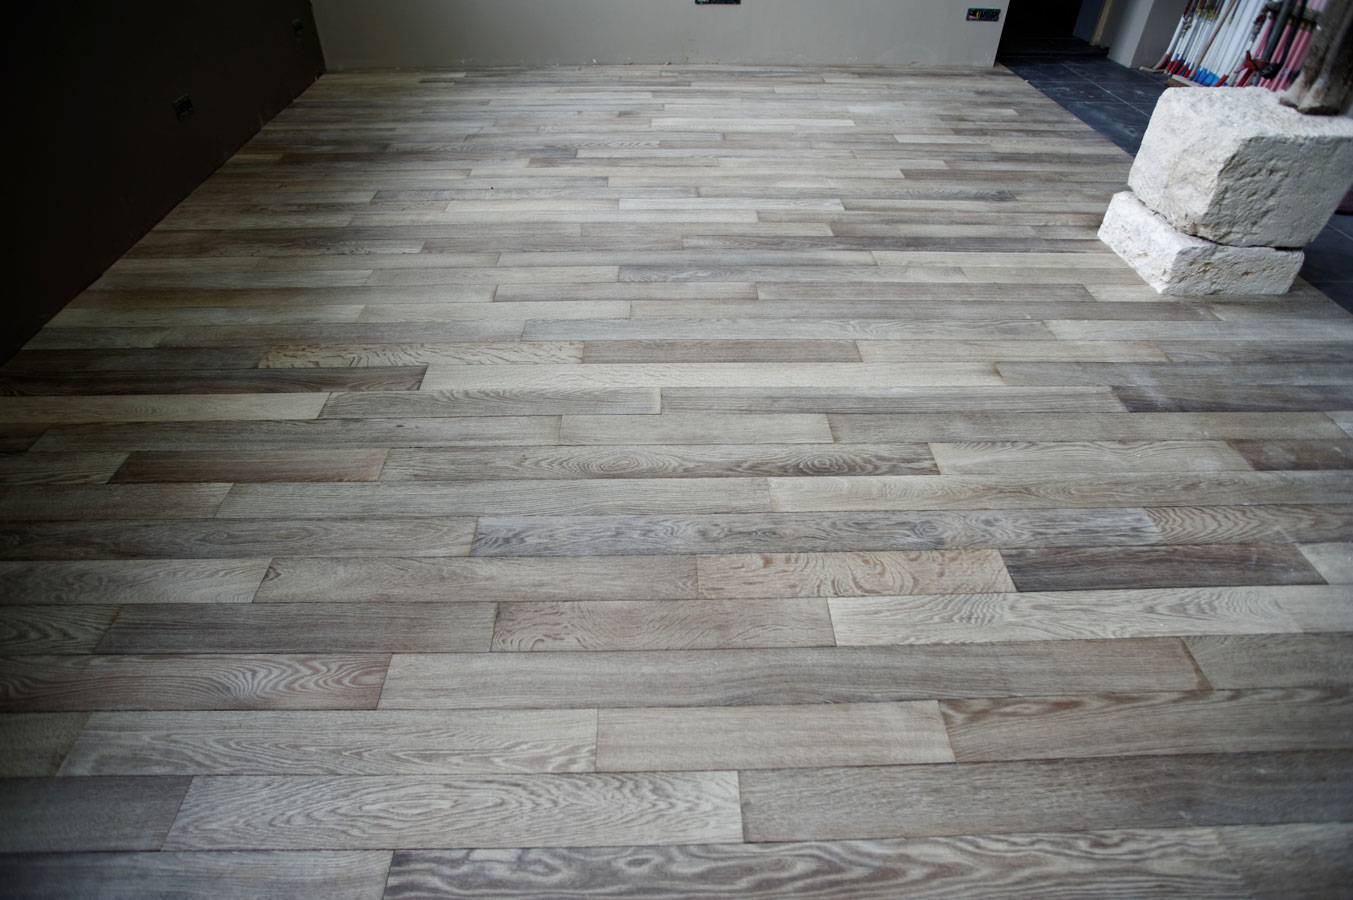 Solid Oak Parquet Flooring Gray Parquets De Tradition - Oak tree hardwood parquet flooring